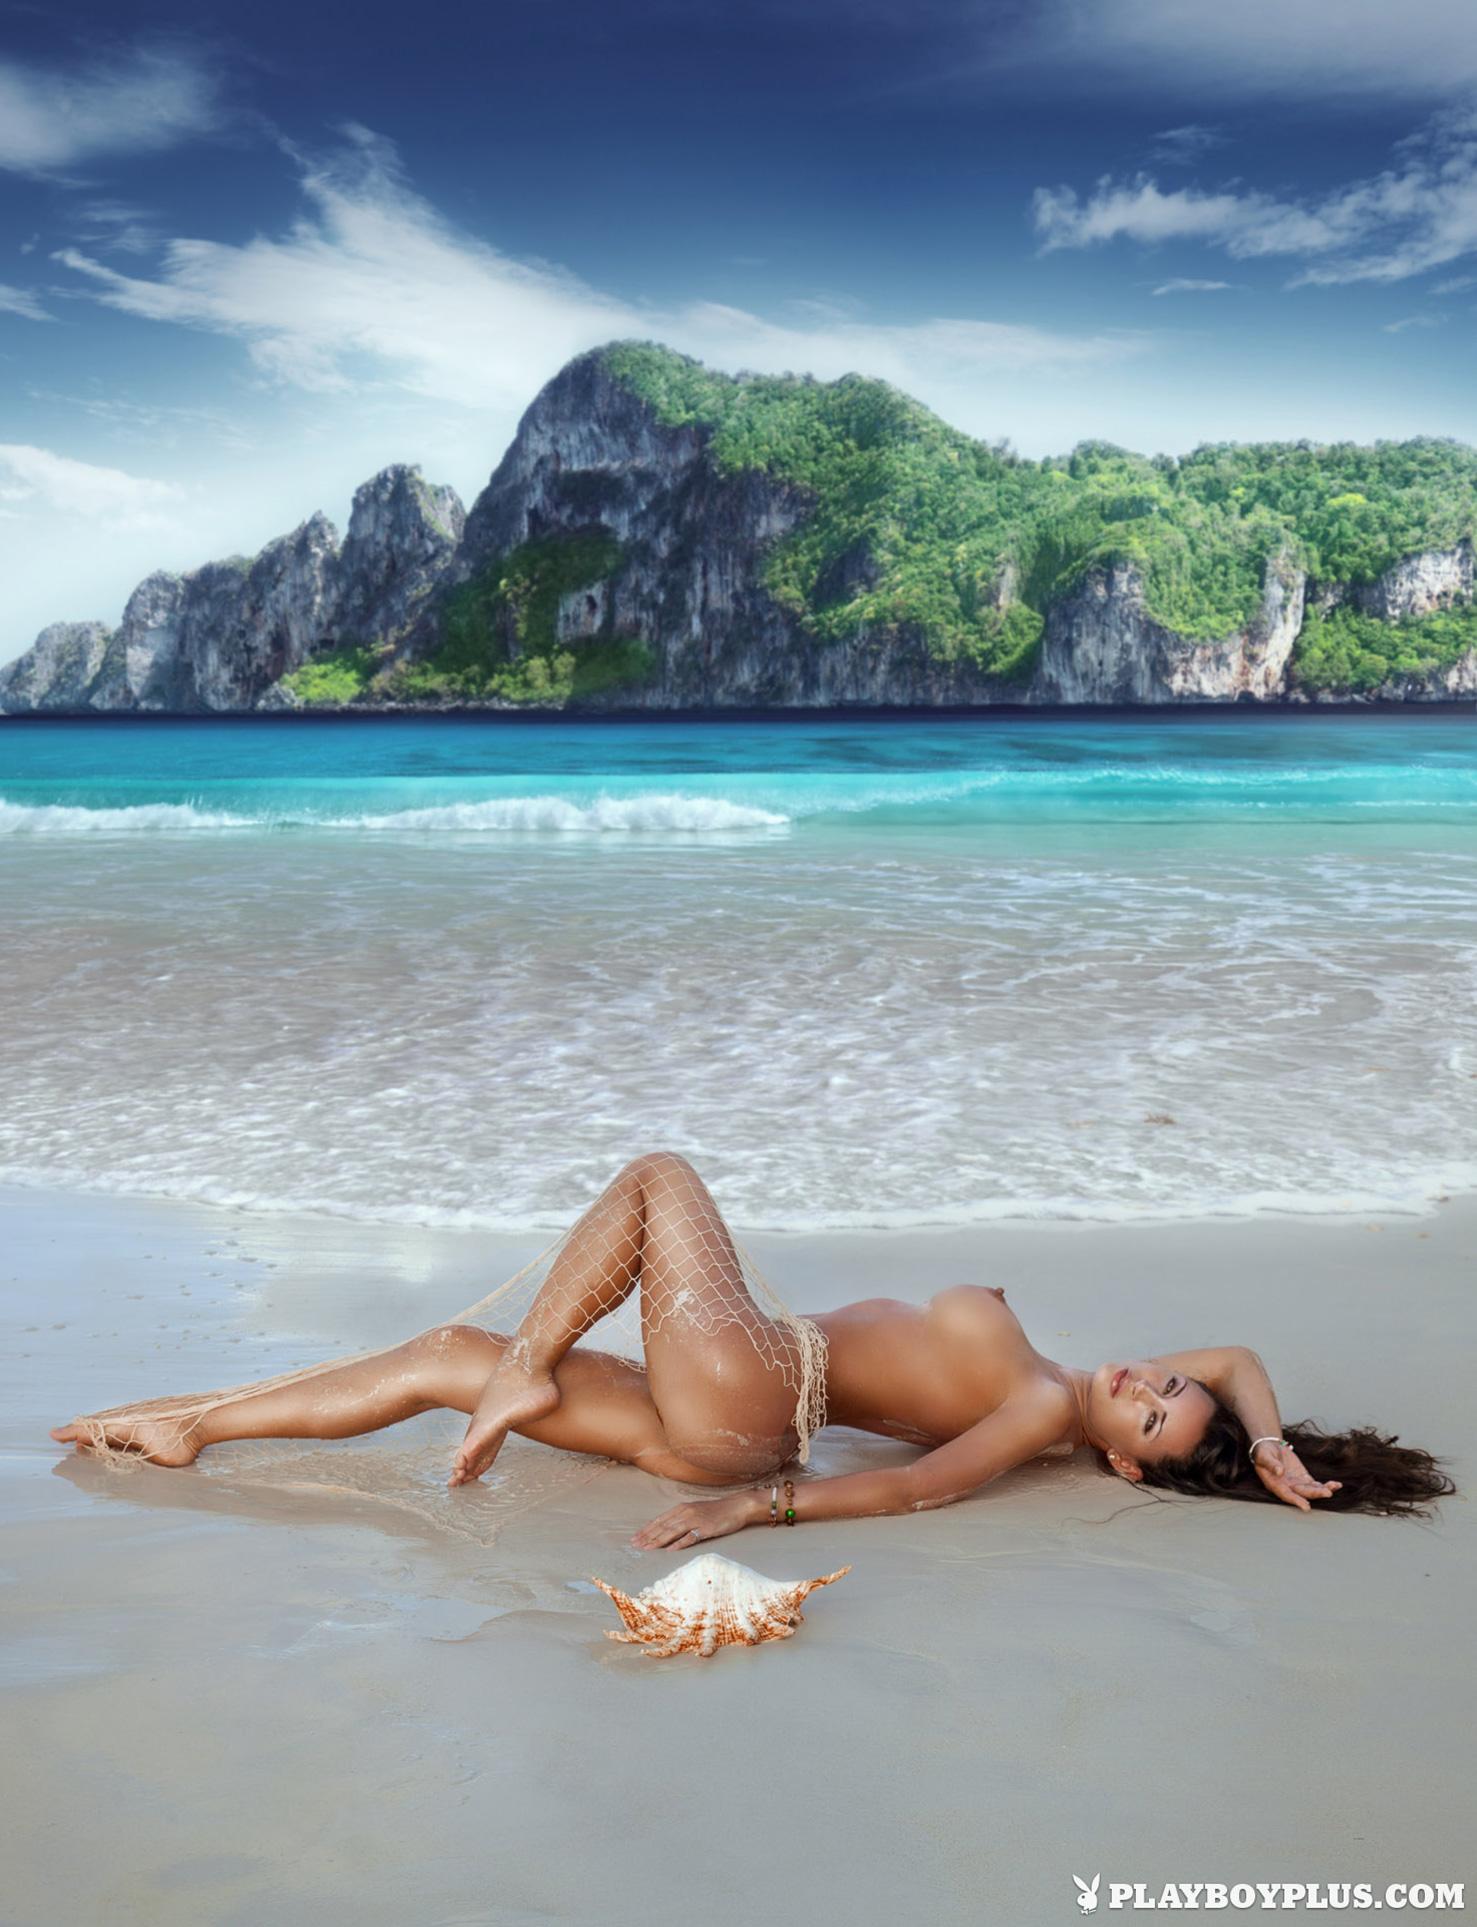 голая на пляже - Анна Григоренко / Anna Grigorenko nude by Salvatore Di Ciaccio - Playboy Украина